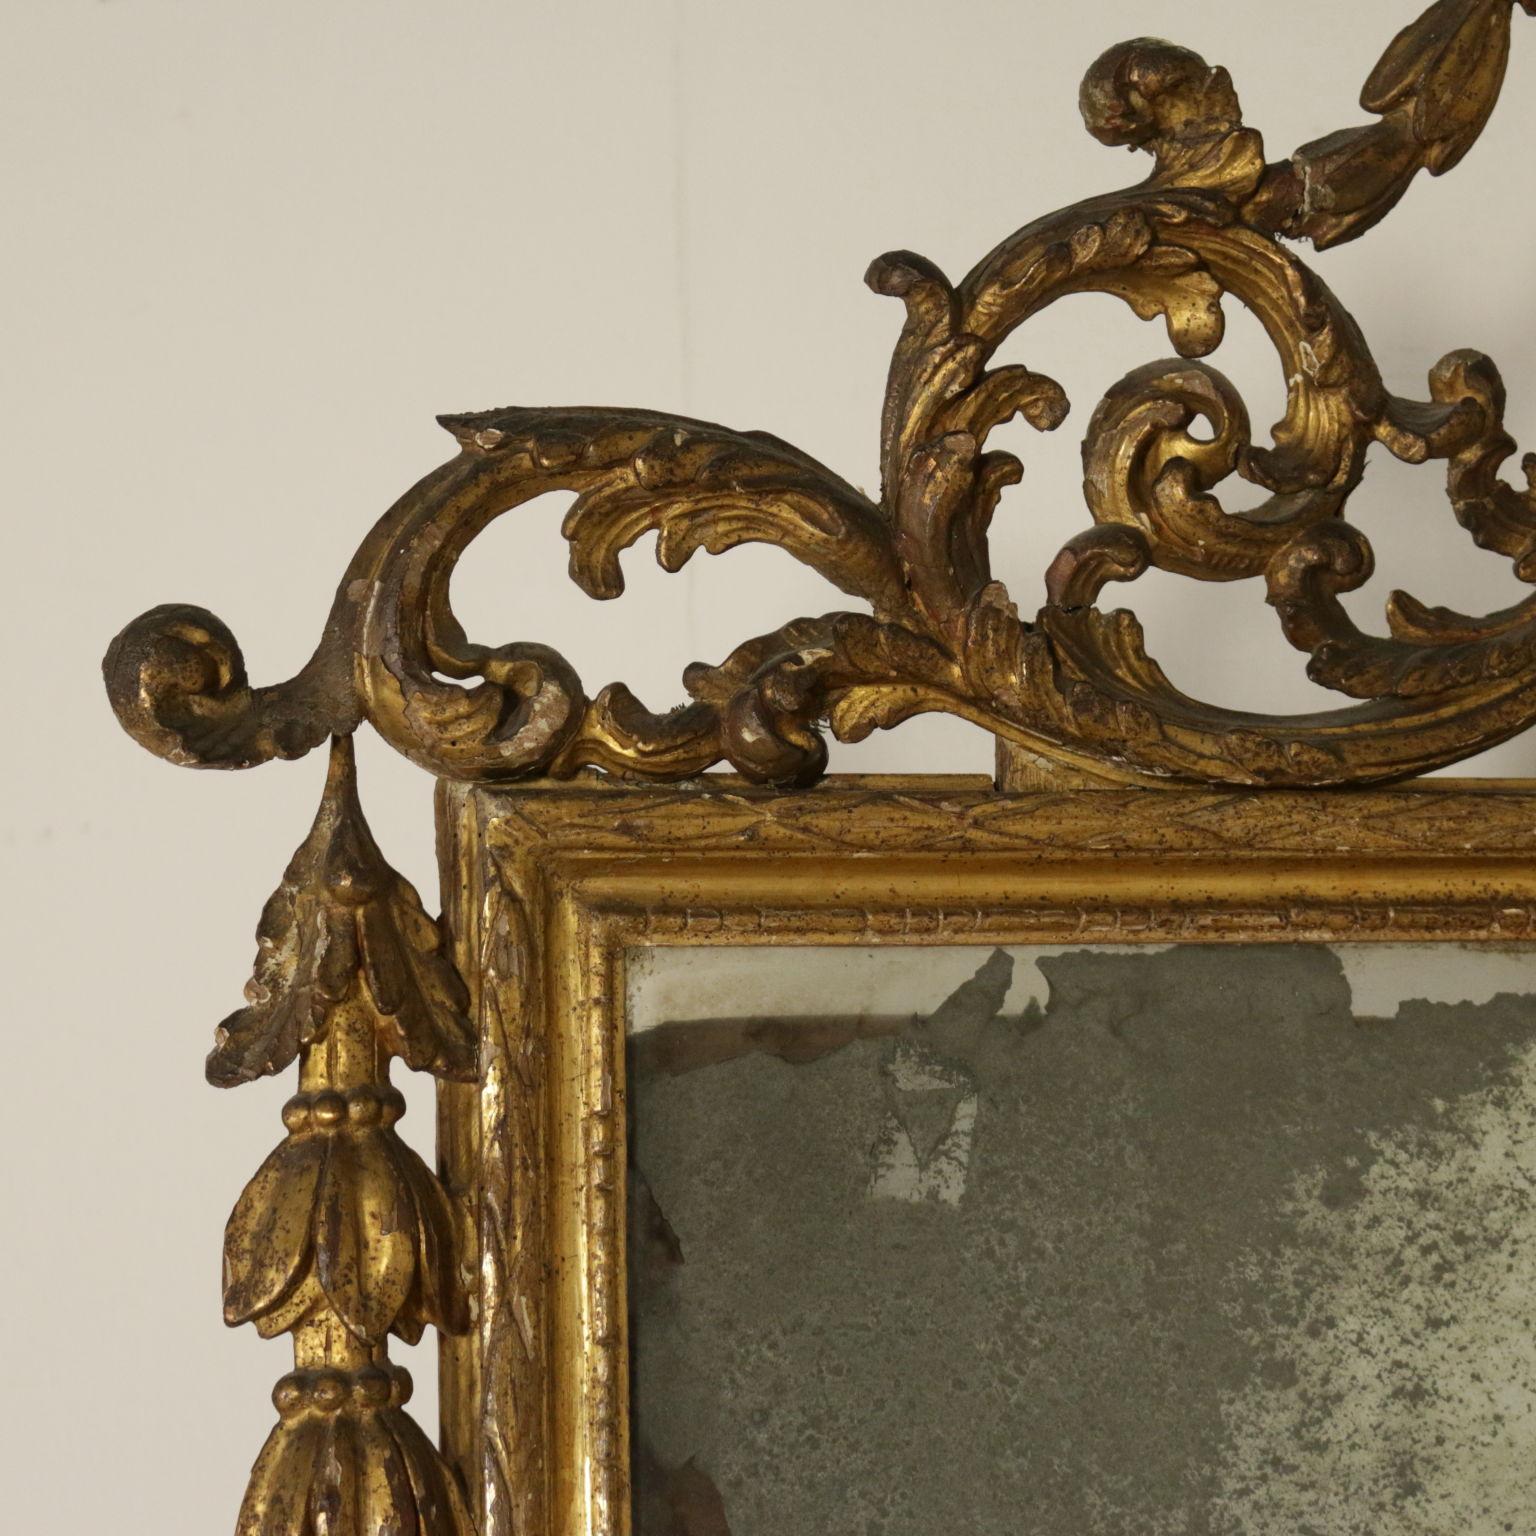 Toaletka W Stylu Neoklasycystycznym Lustra I Ramki Antyki